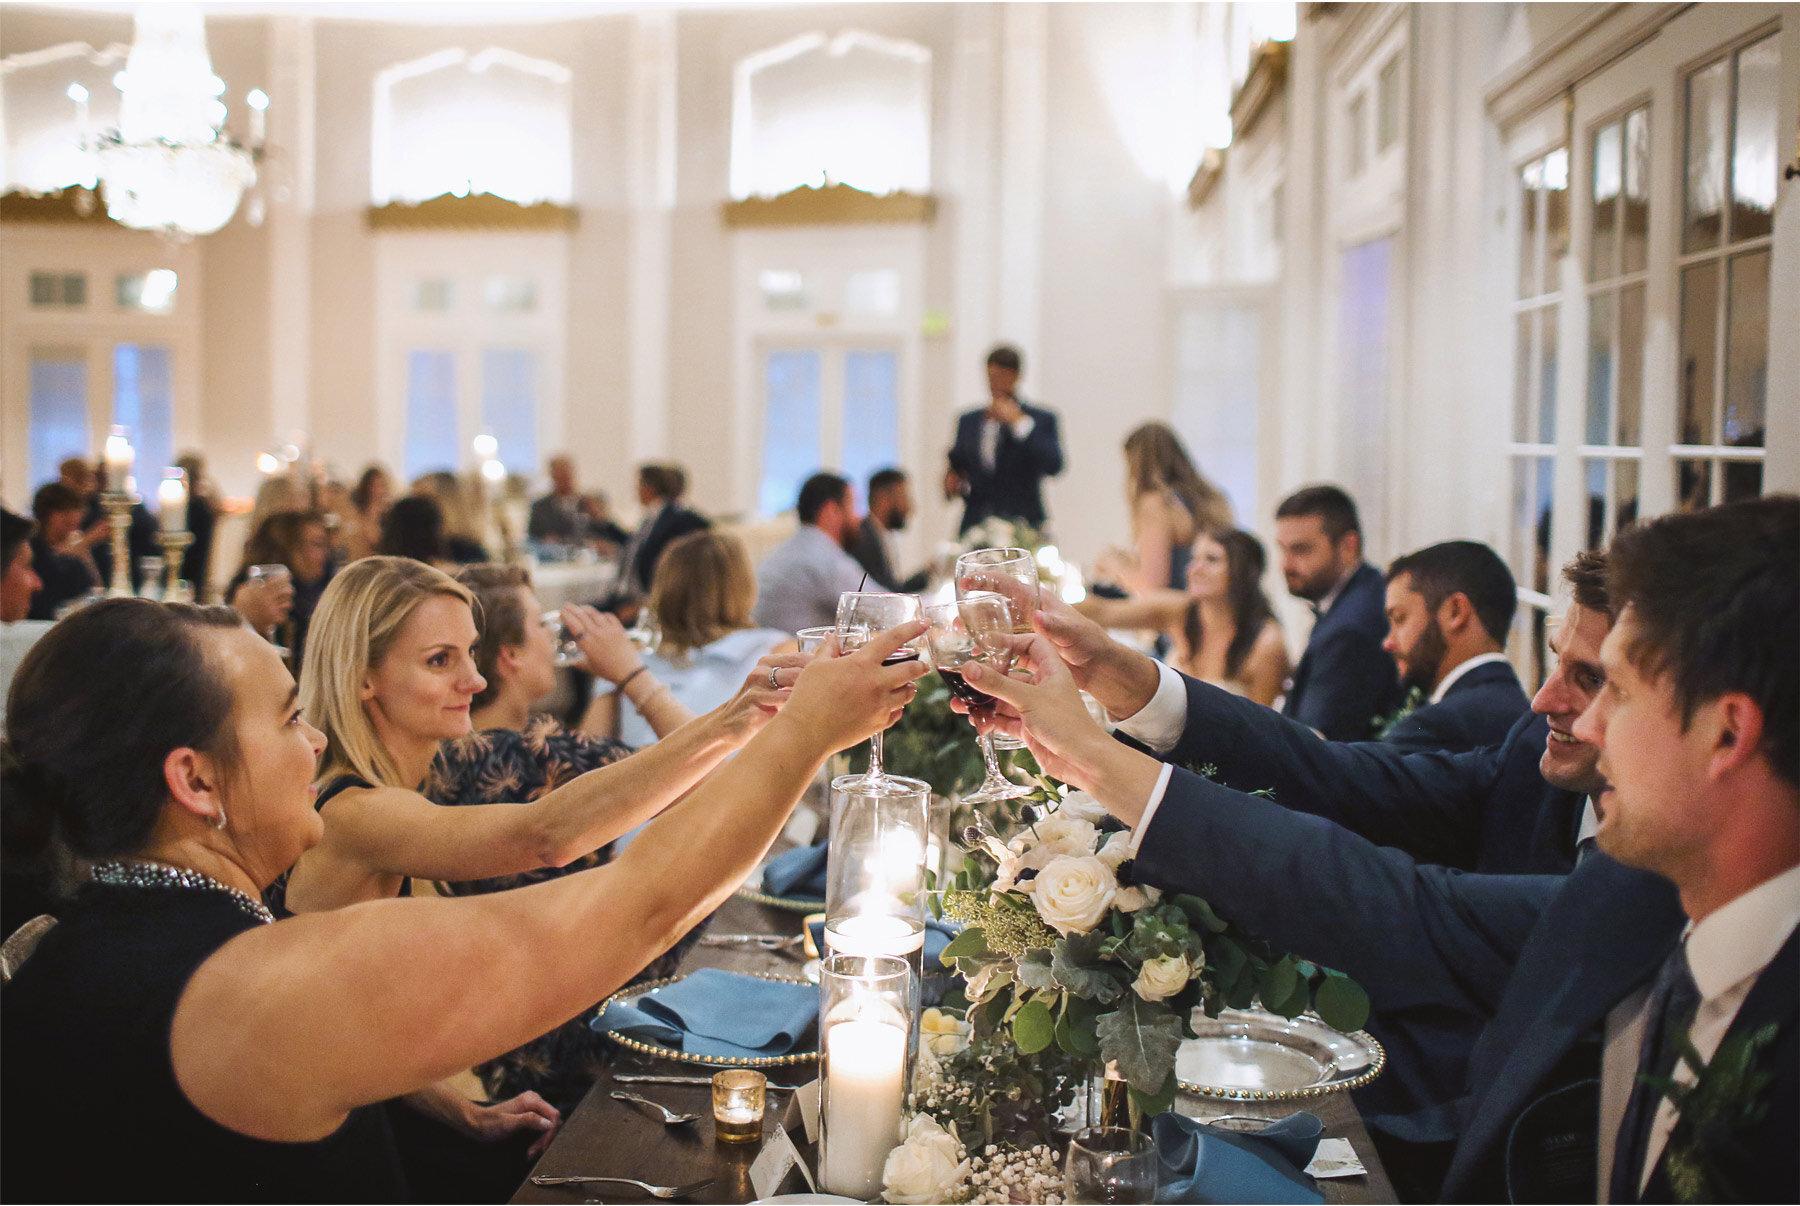 18-Vick-Photography-Wedding-Minnetonka-Minnesota-Lafayette-Club-Reception-Toasts-Katie-and-David.jpg